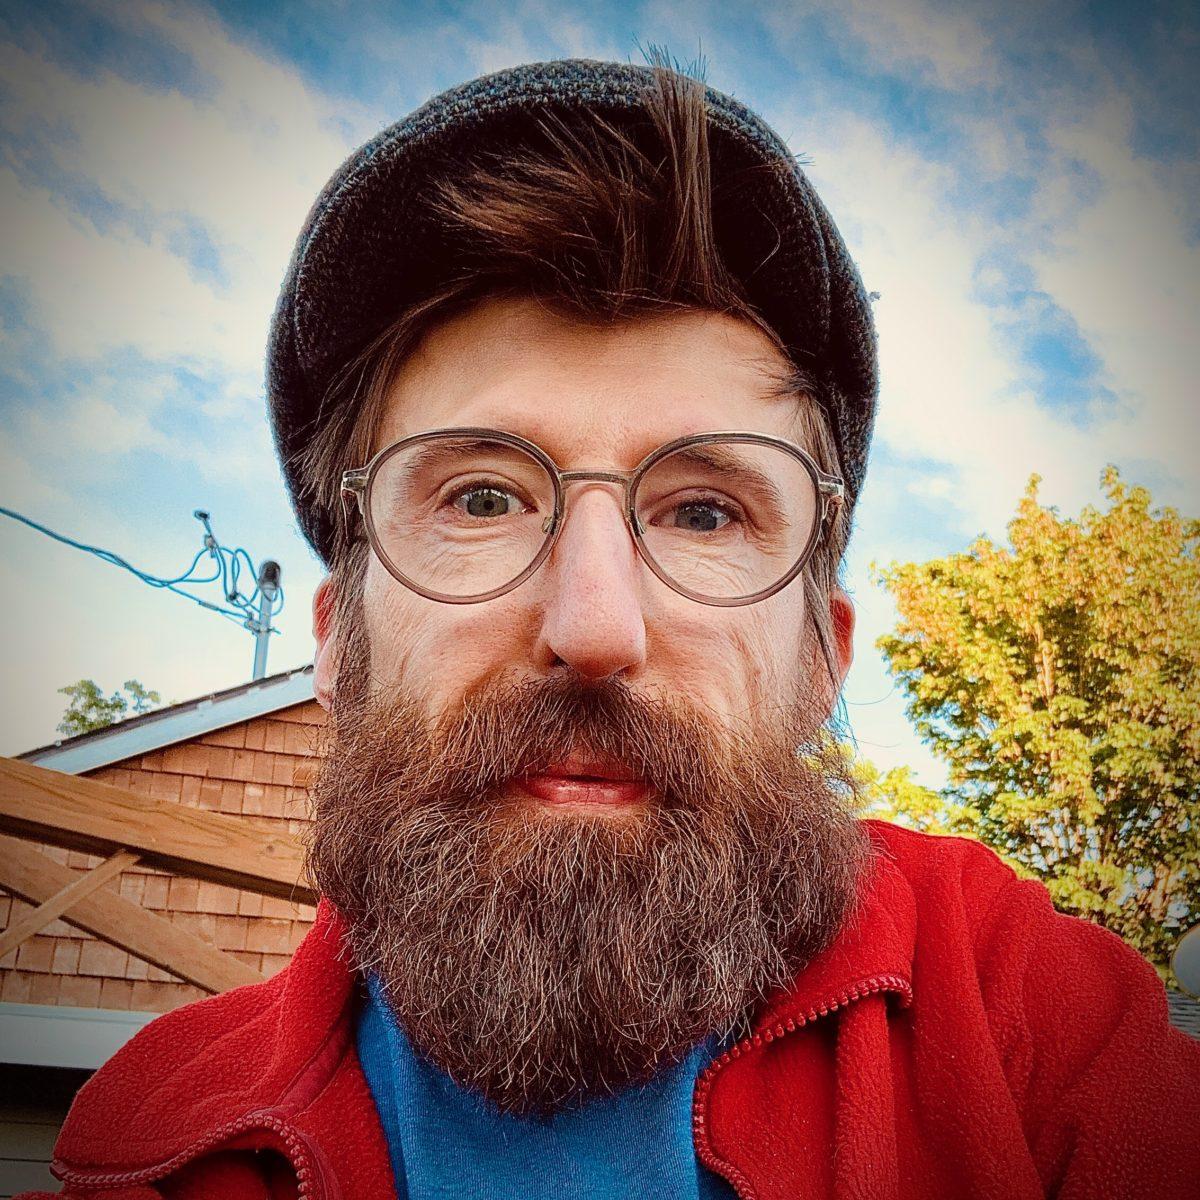 Portrait Photo of Steve Hardin - 2020